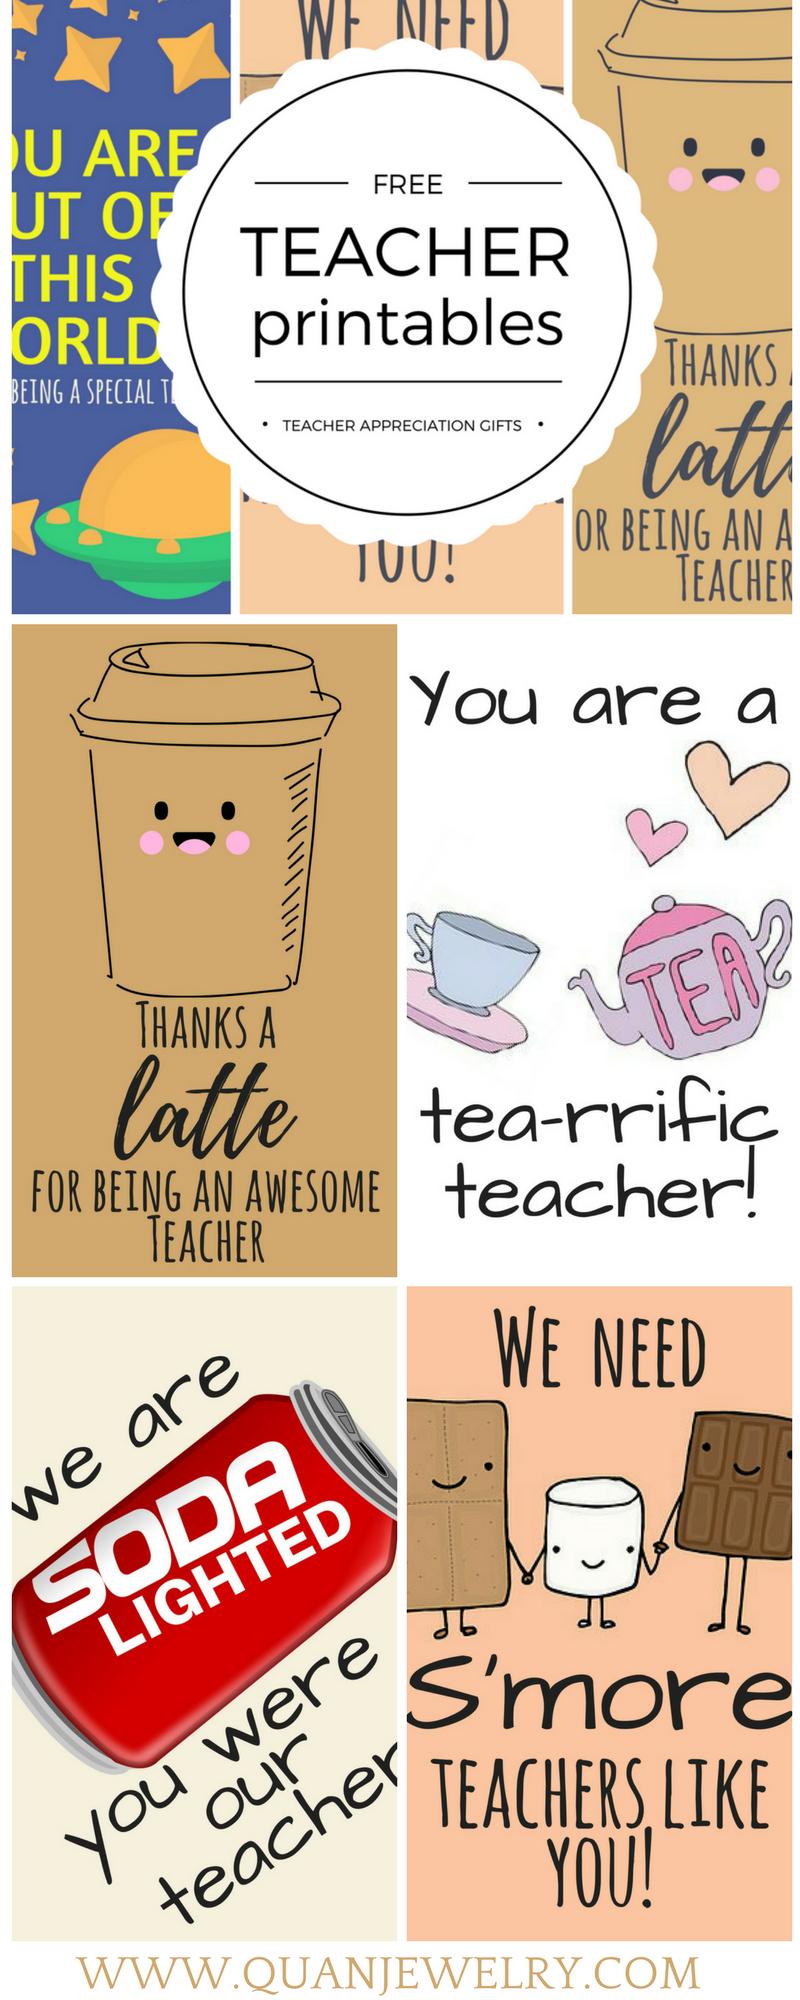 Free Printable Teacher Appreciation Thank You Cards | Teacher Gift - Free Teacher Appreciation Week Printable Cards